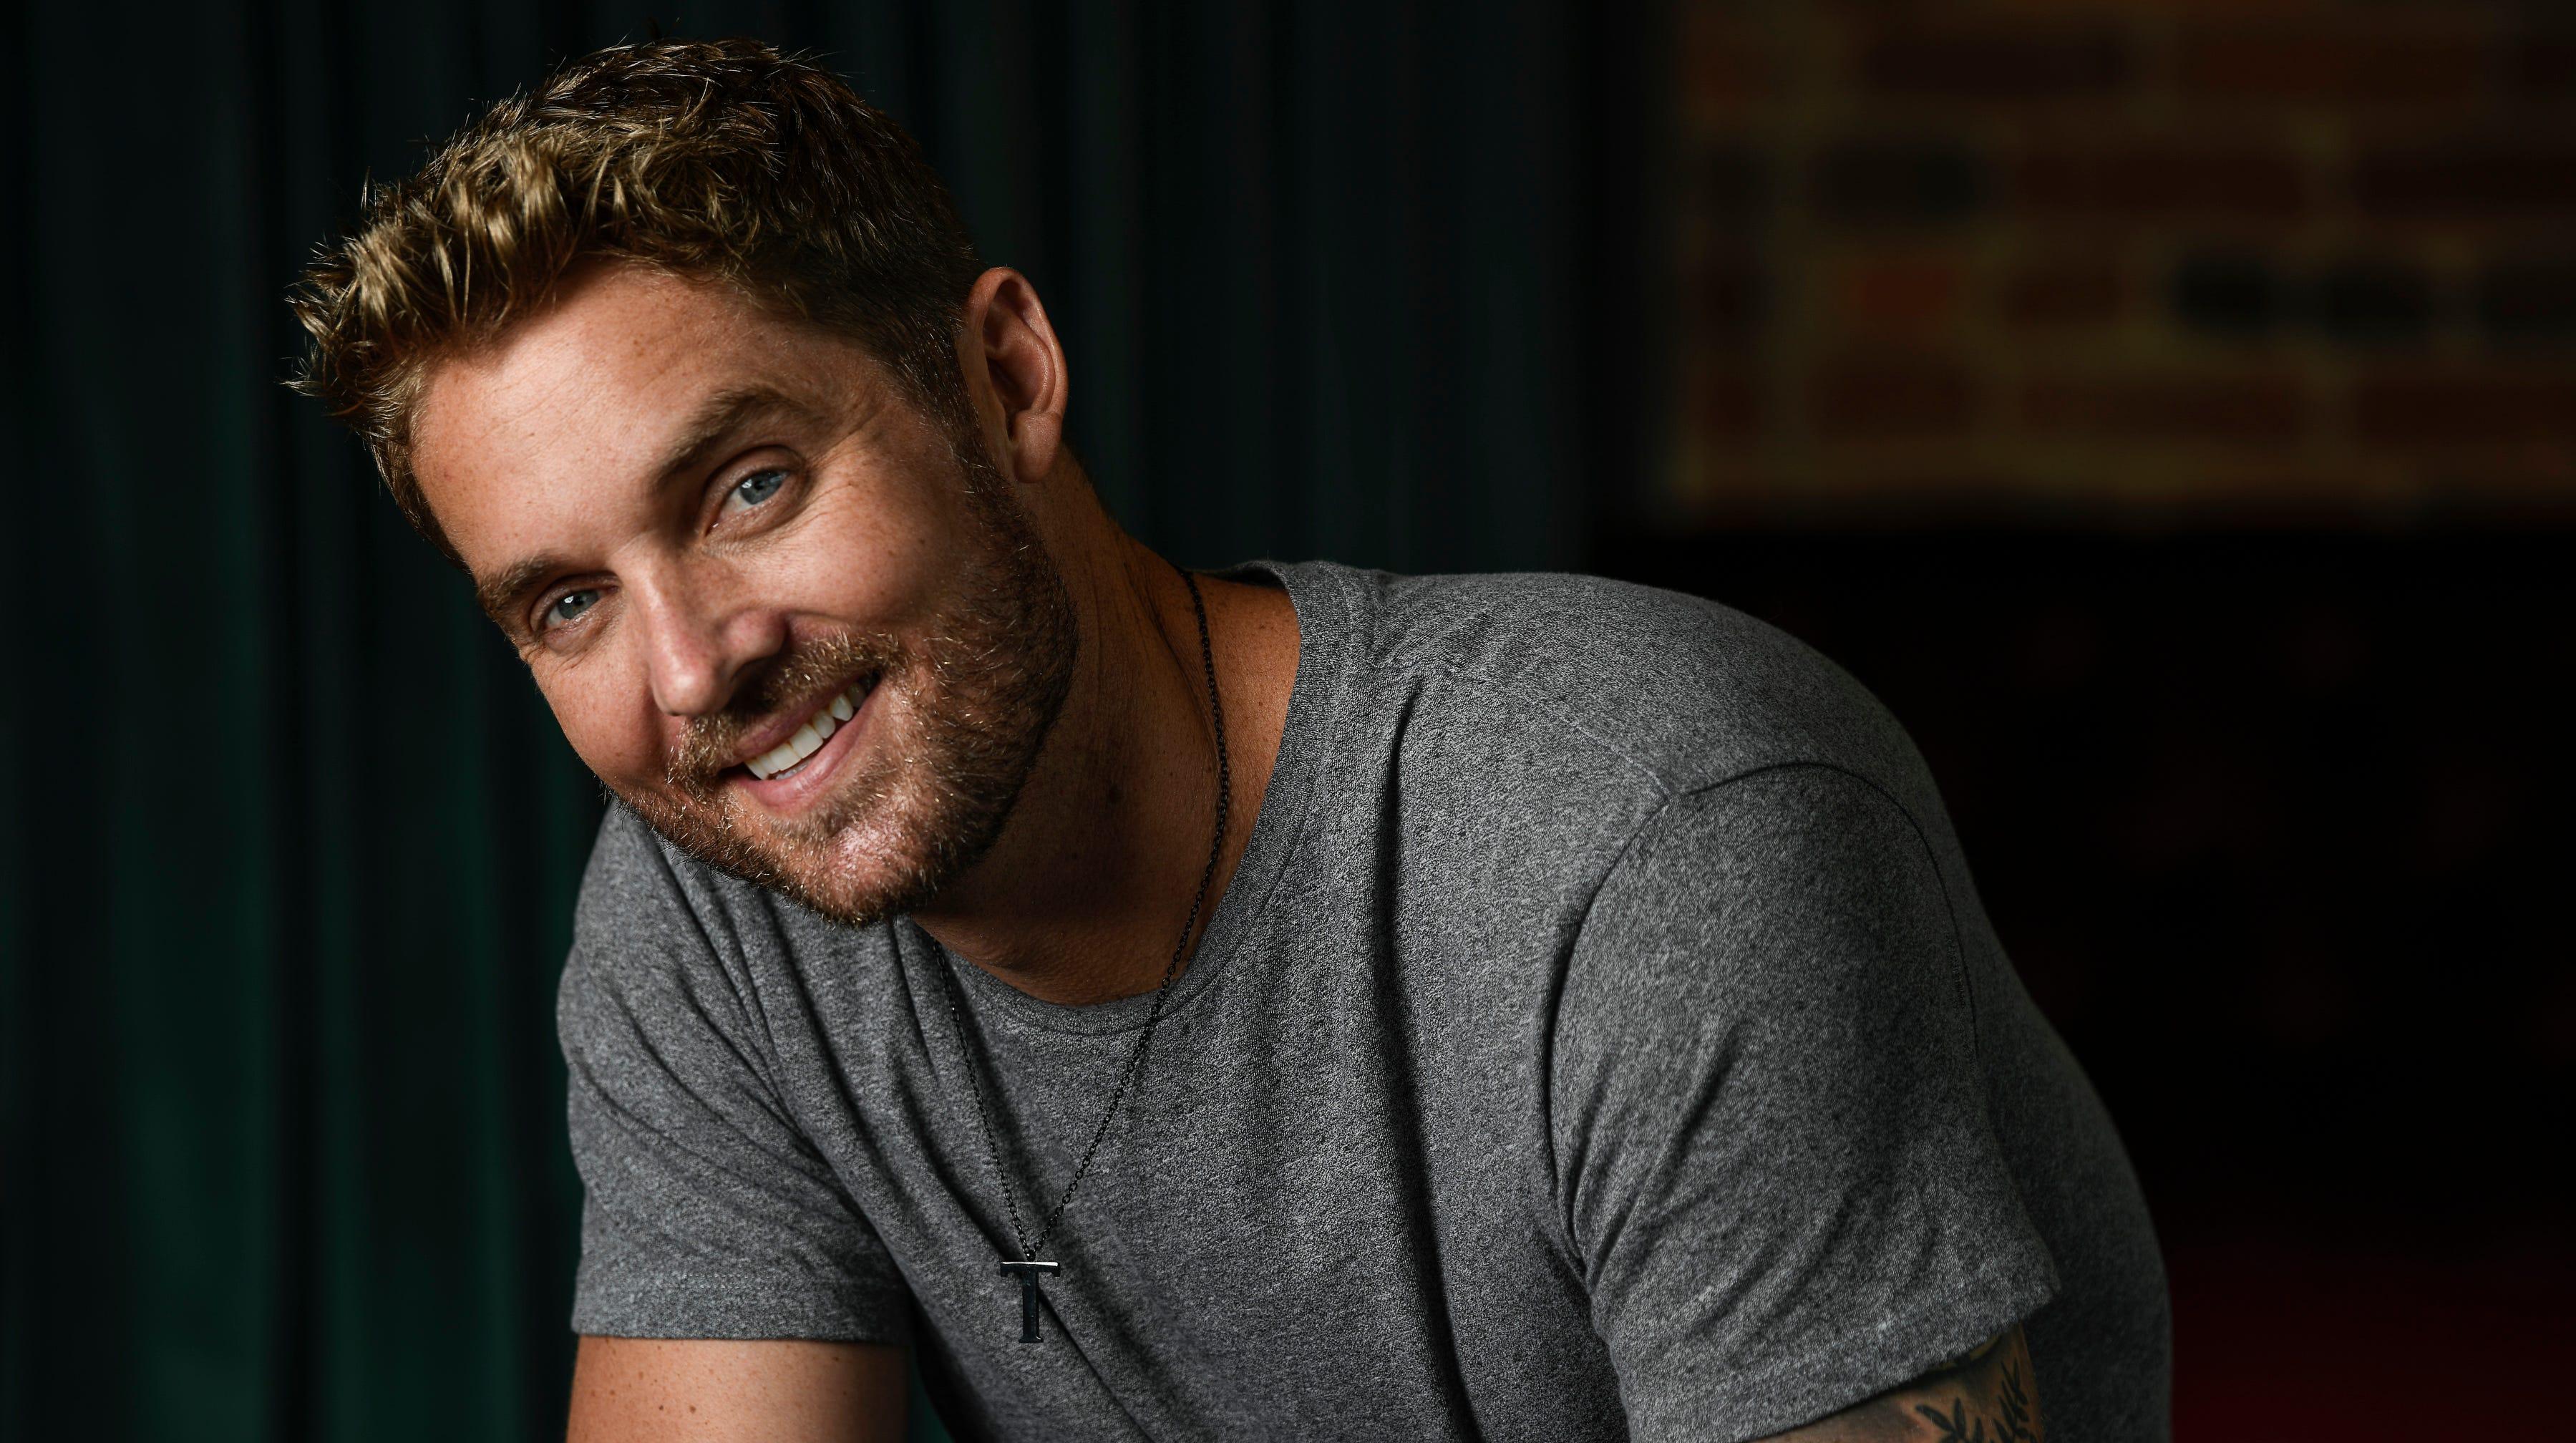 CMA New Artist of the Year nominee Brett Young Wednesday, Oct. 10, 2018, in Nashville, Tenn.